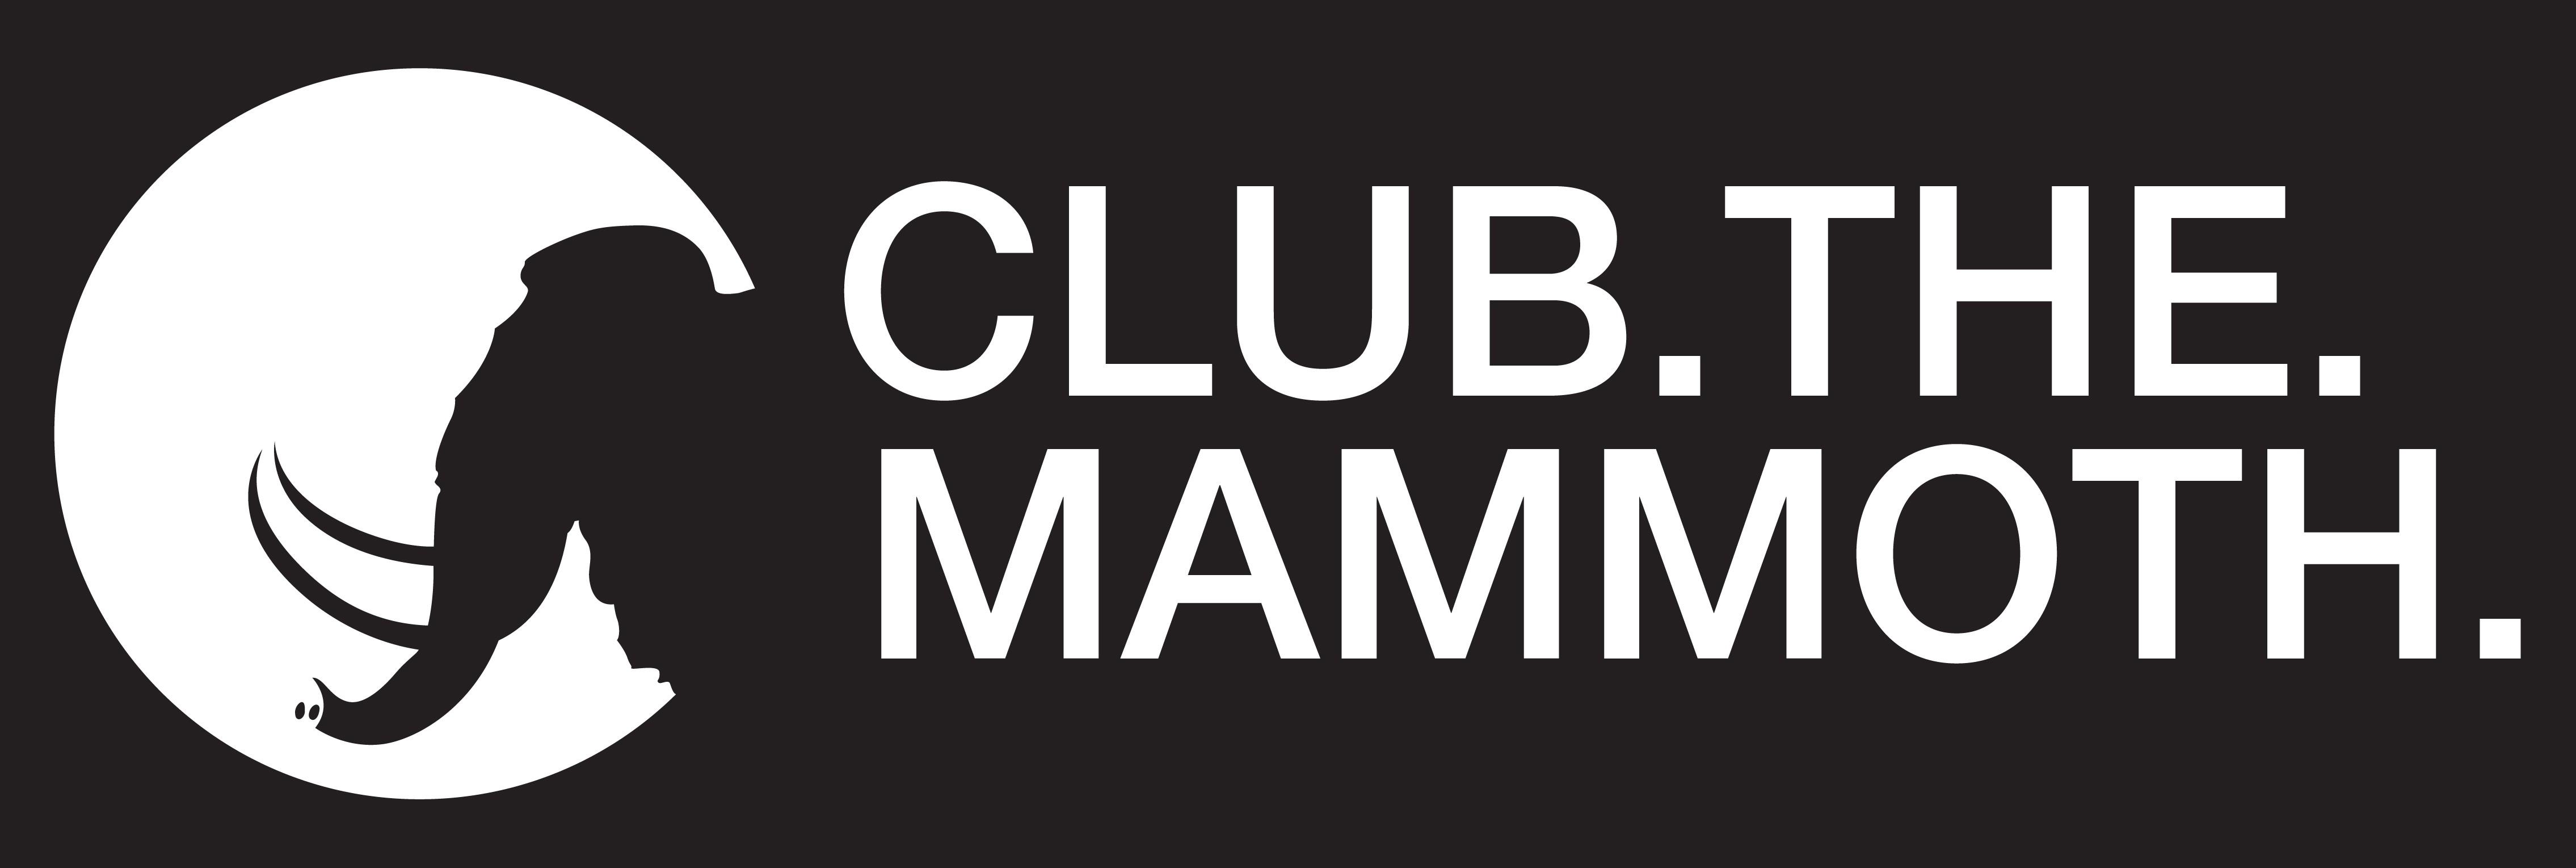 clubthemammoth